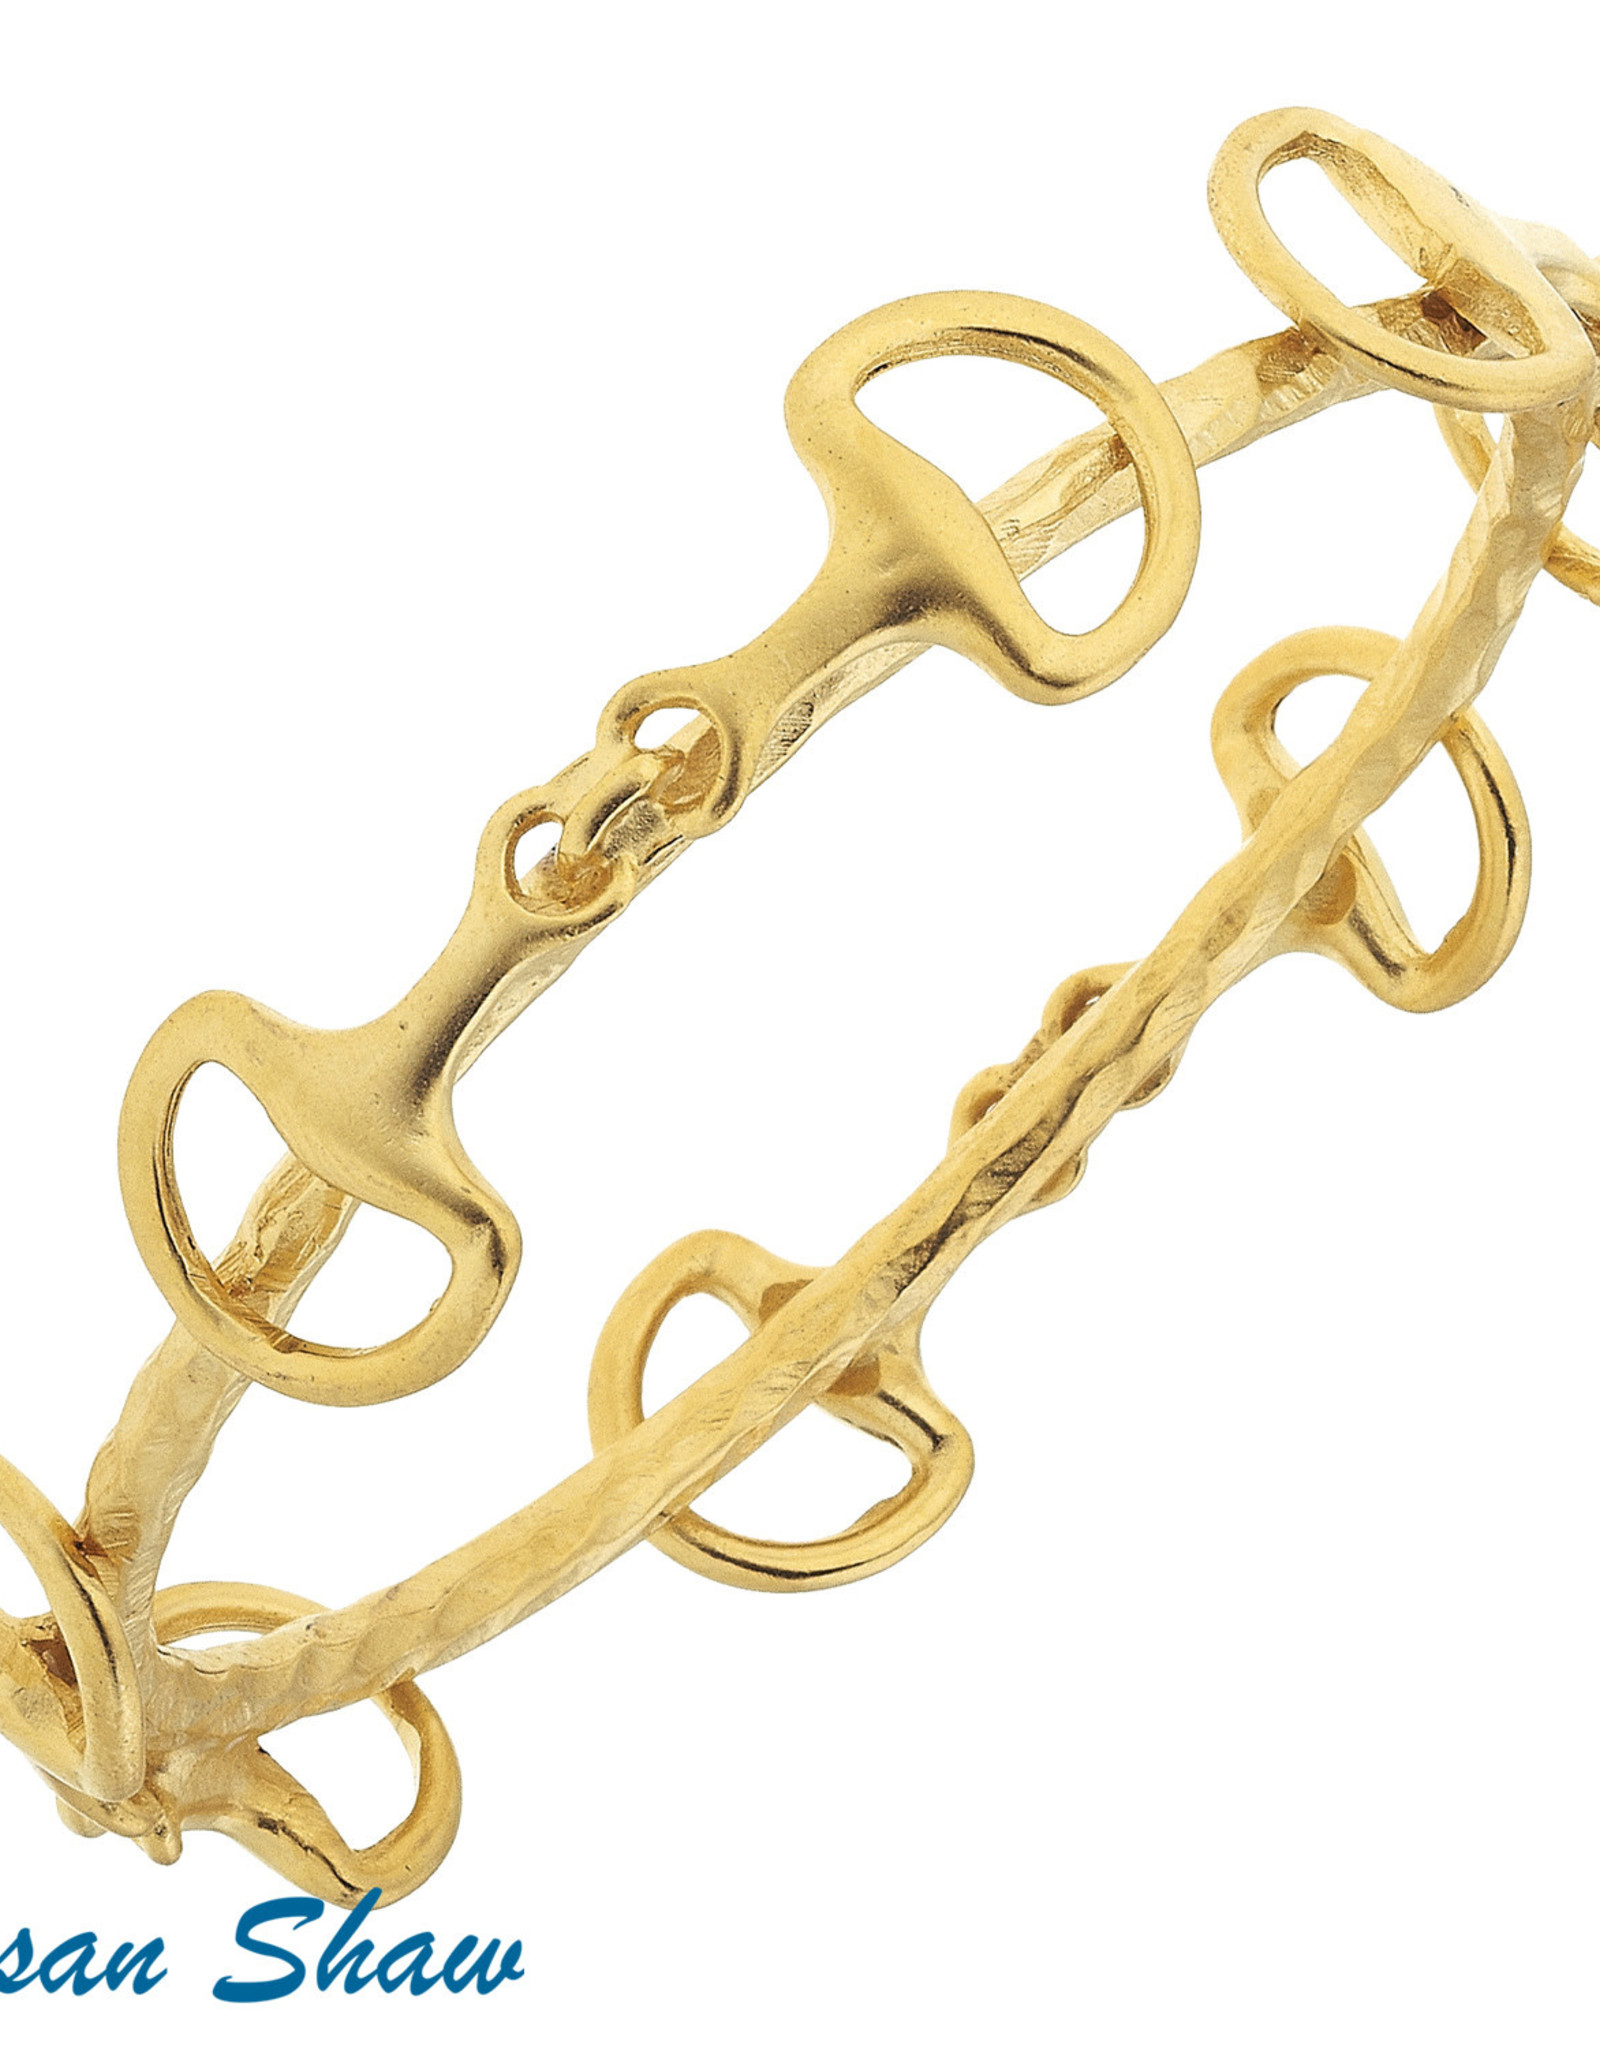 Susan Shaw Shaw Bracelet GOLD Horse Bit Bangle